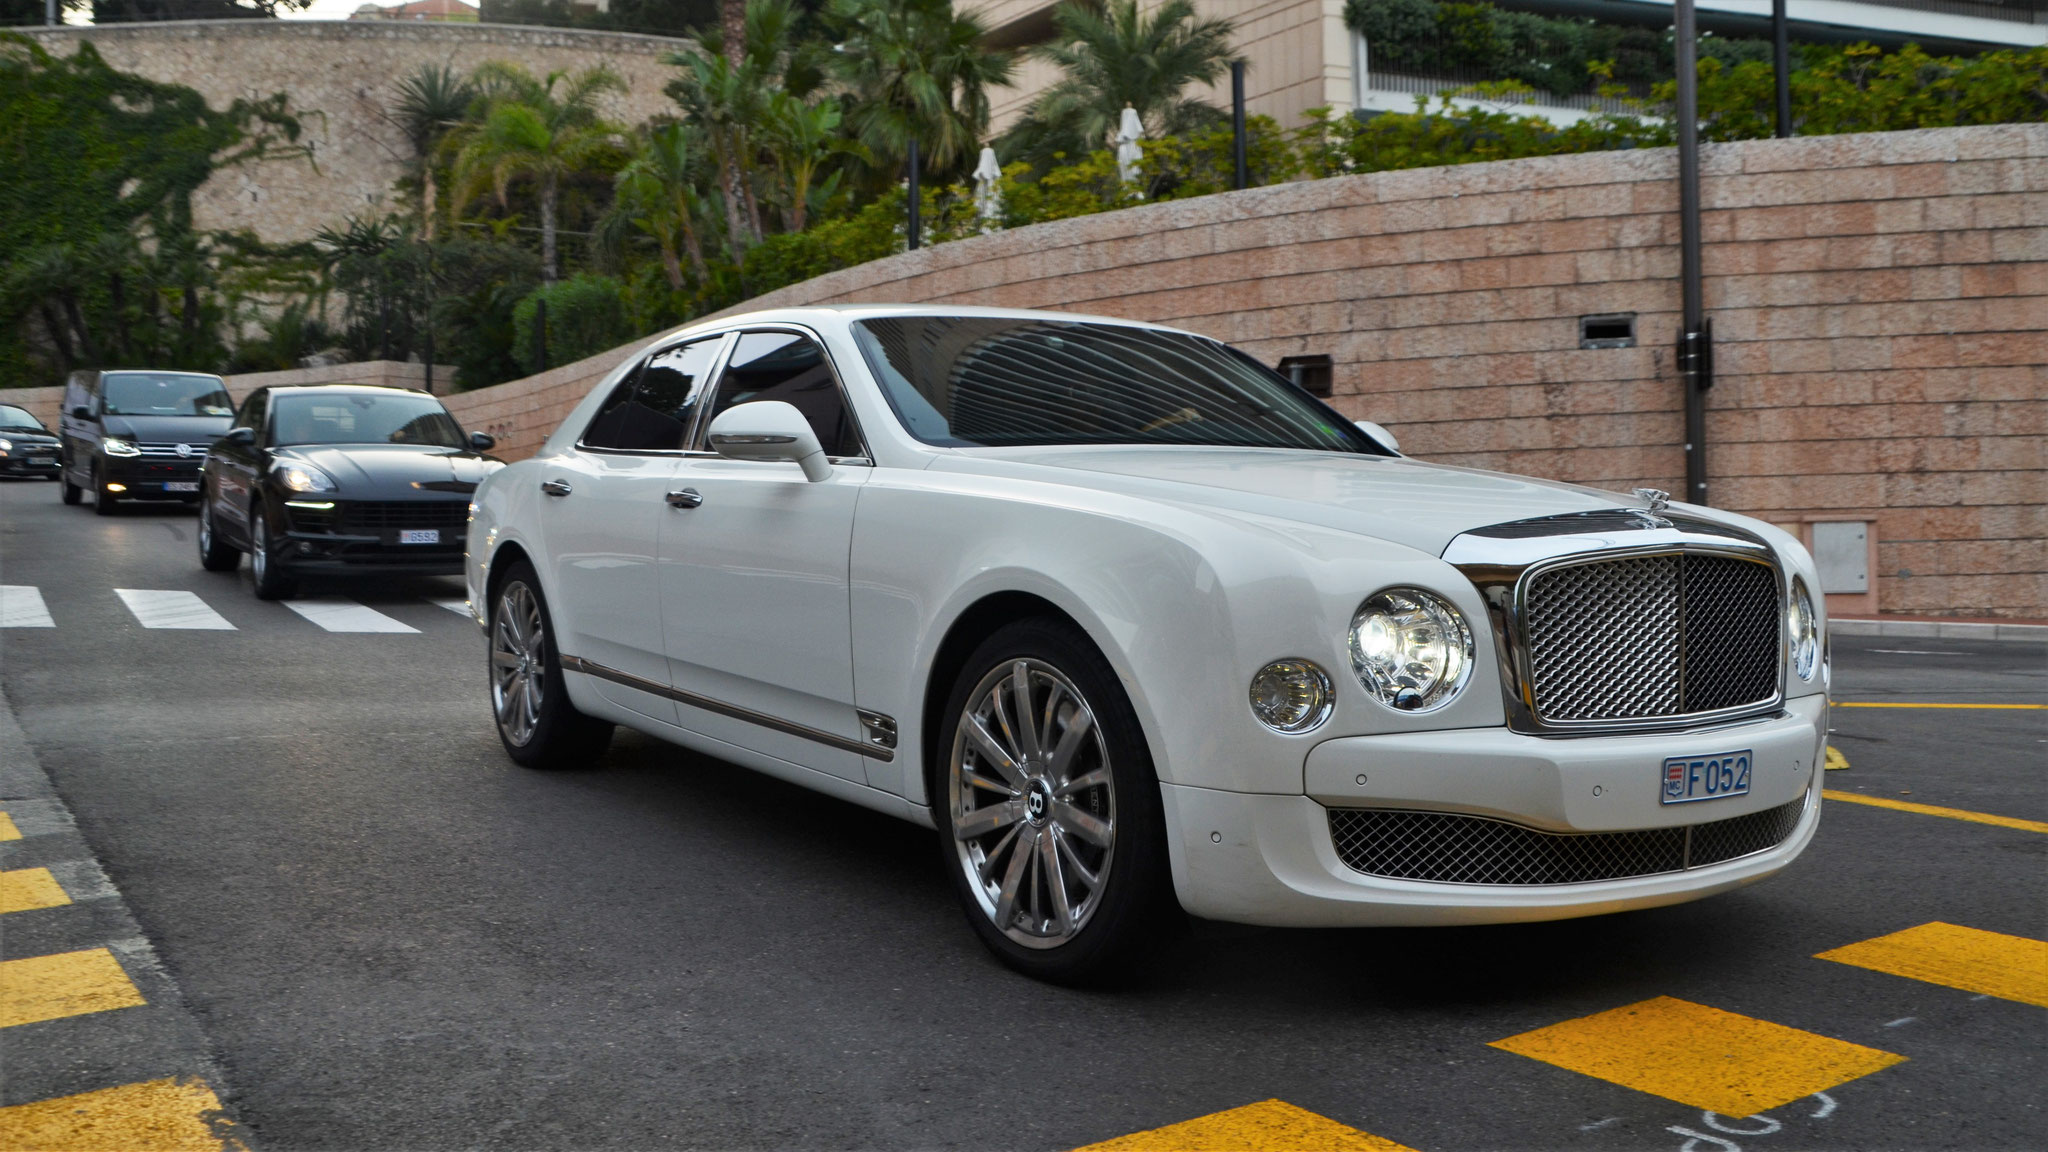 Bentley Mulsanne - F052 (MC)